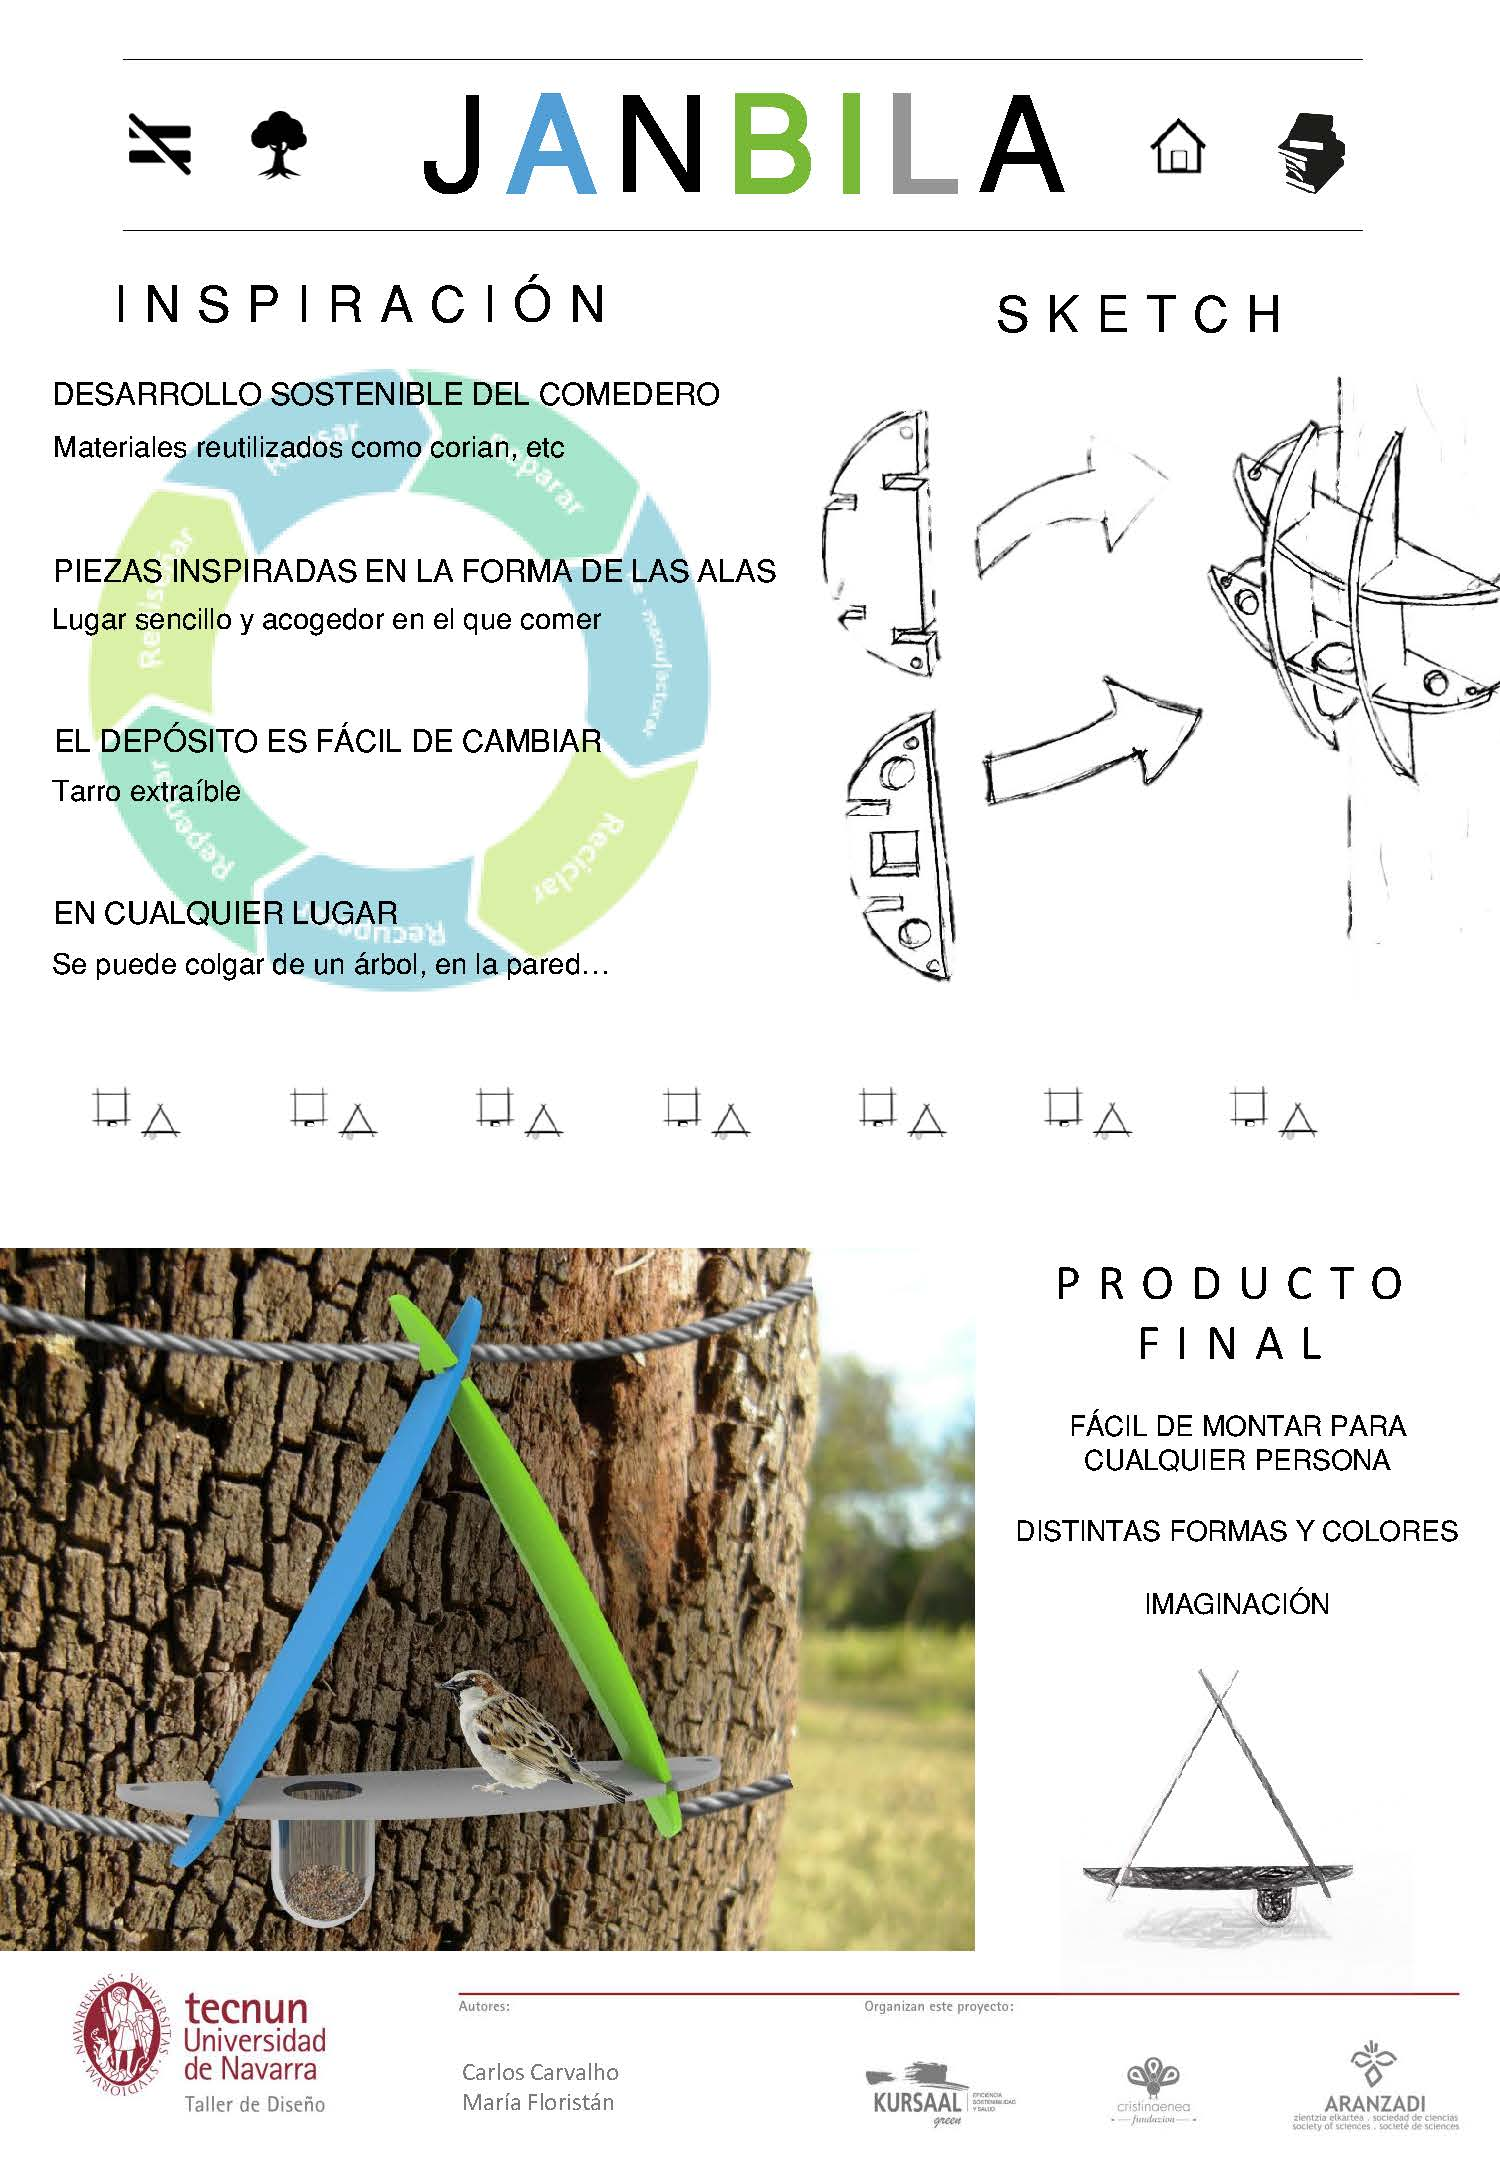 Taller de diseño - Tecnum - Txoriak - JANBILA